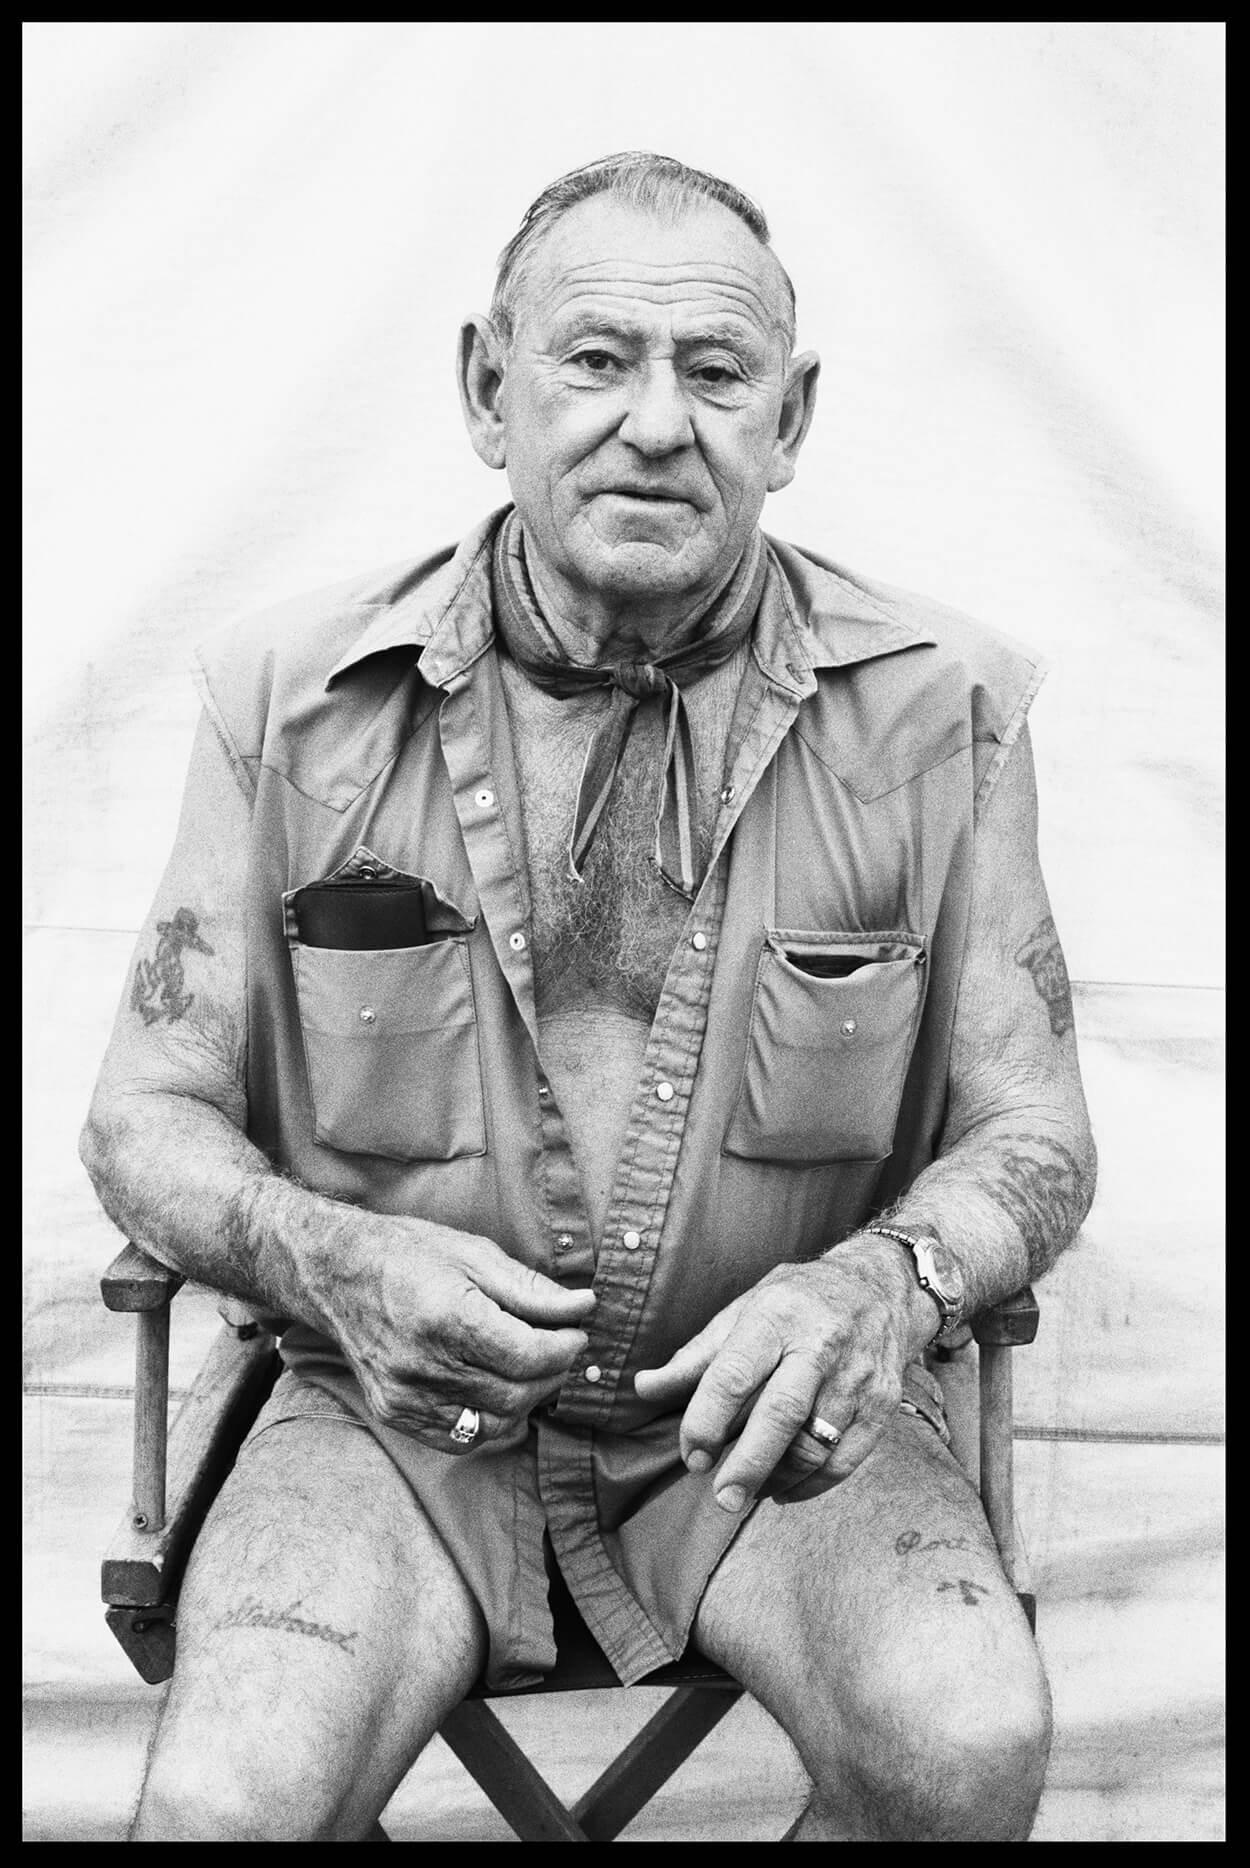 MAN WITH NO PANTS - Roadbook - Hunter Barnes Photography